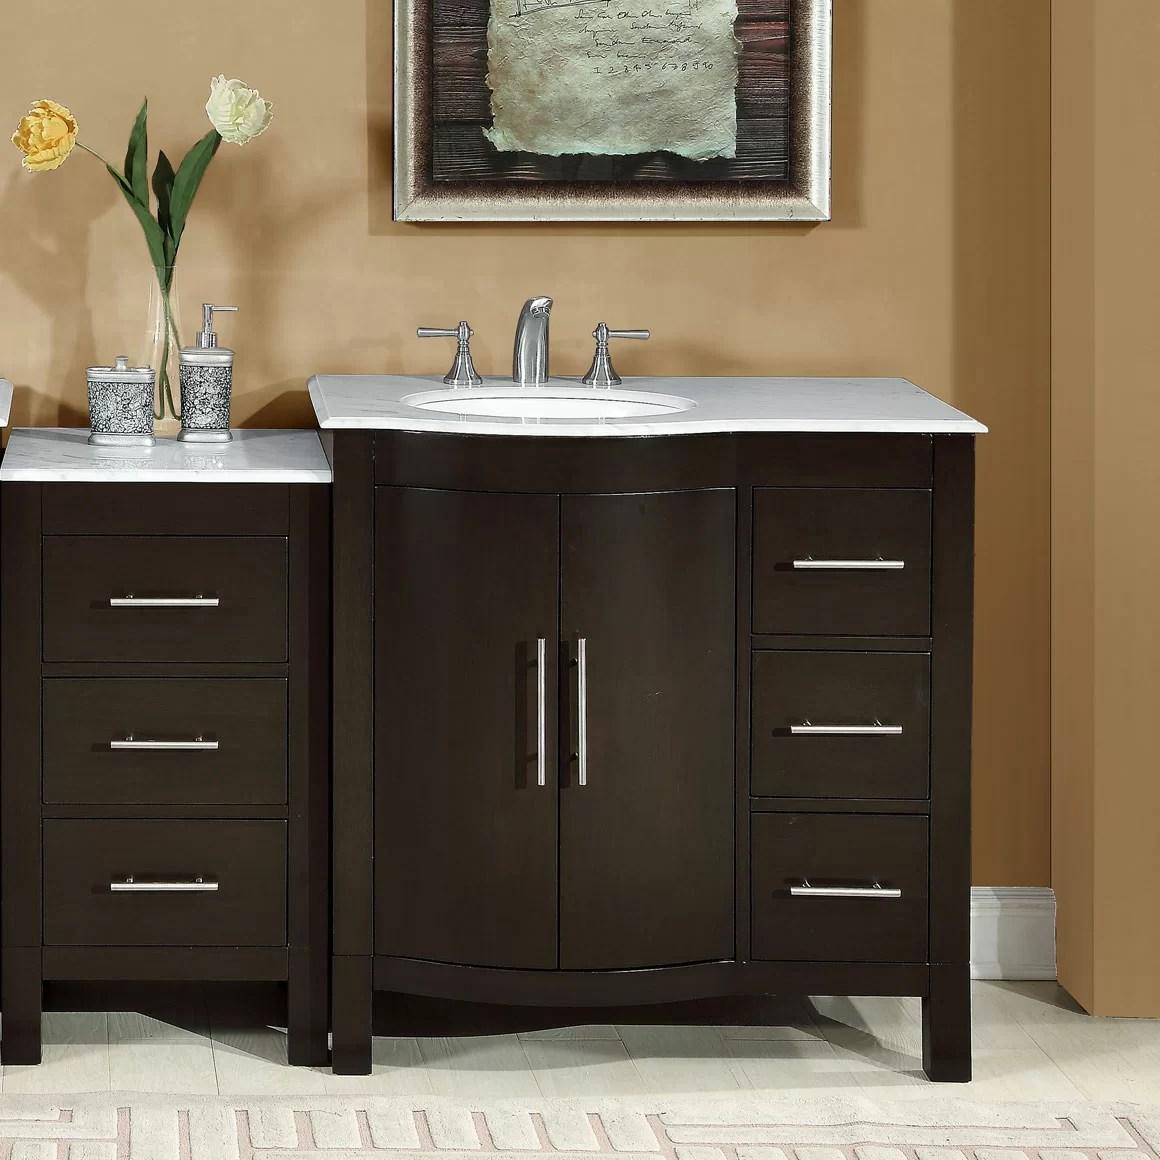 Silkroad Exclusive 535 Single Sink Lavatory Cabinet